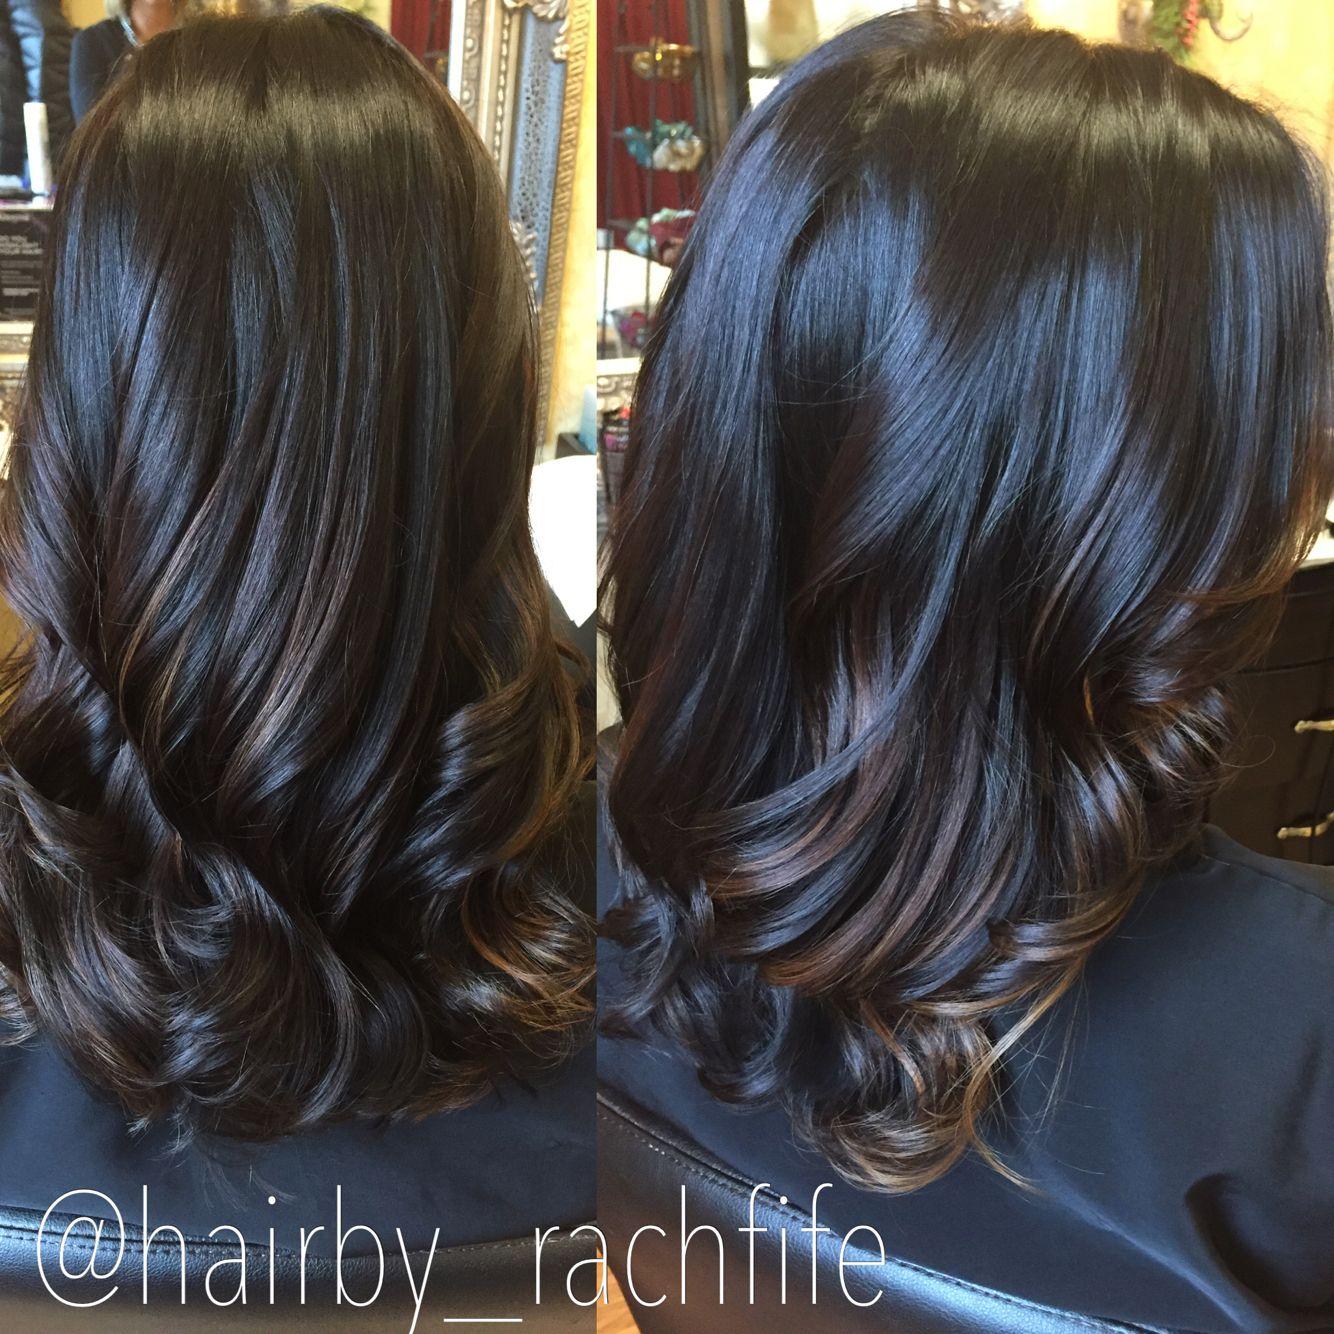 Dark Chocolate Brown With Subtle Caramel Balayage Highlights Hair By